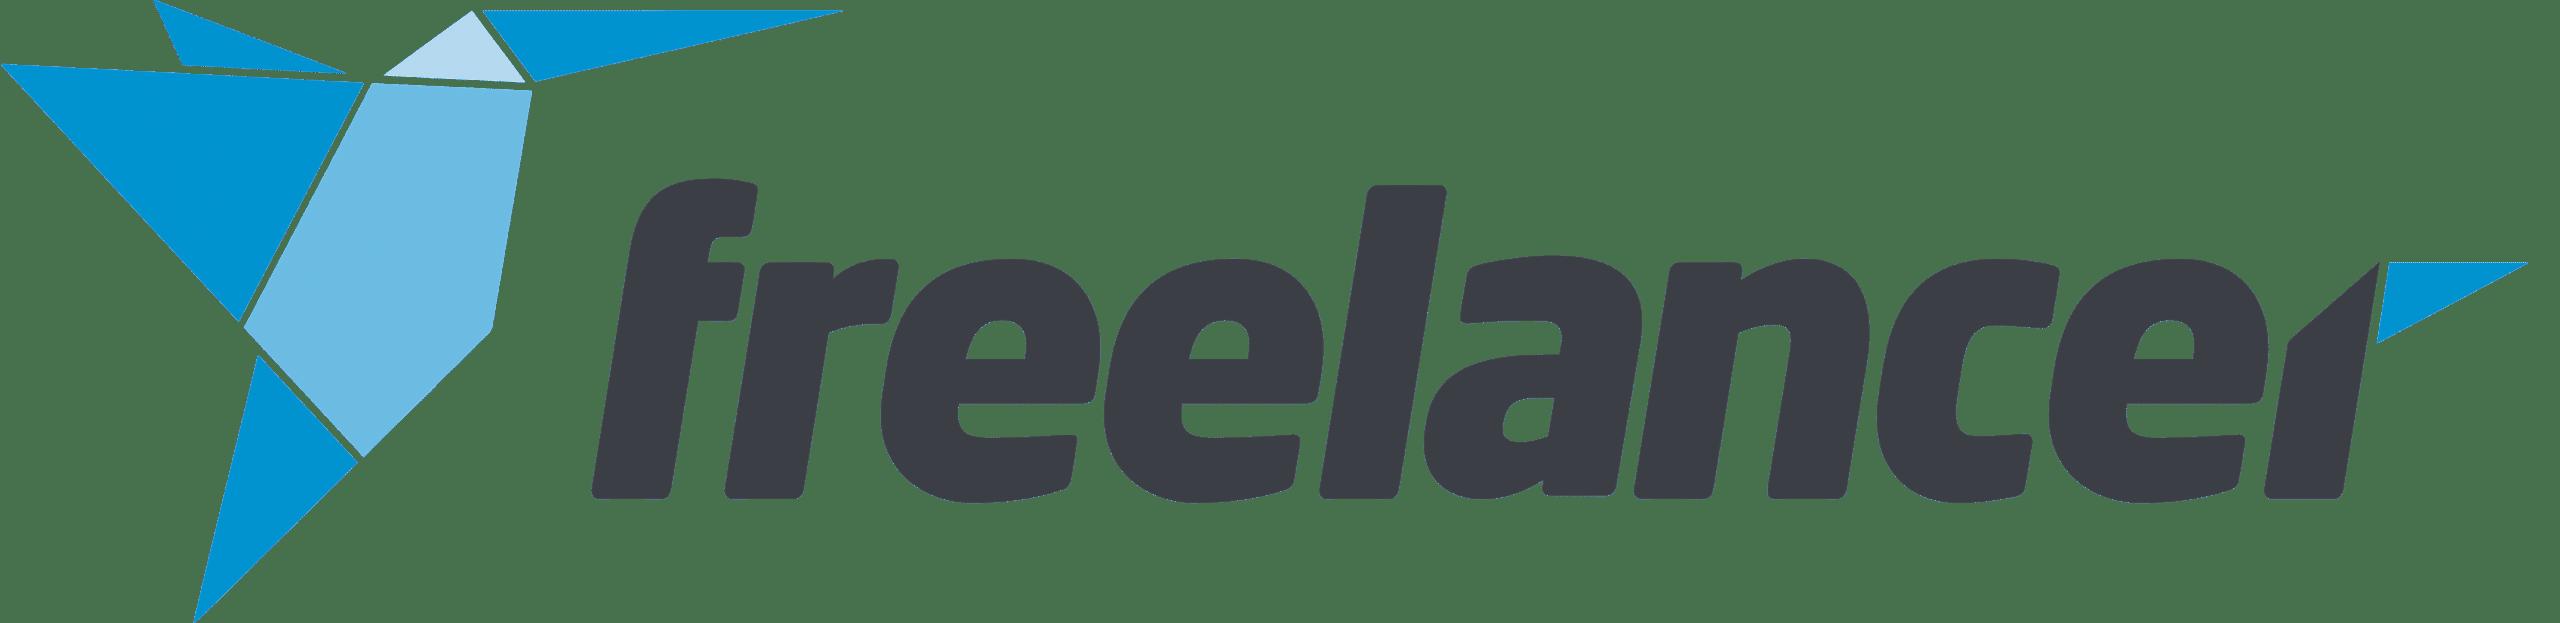 Freelancer_logo